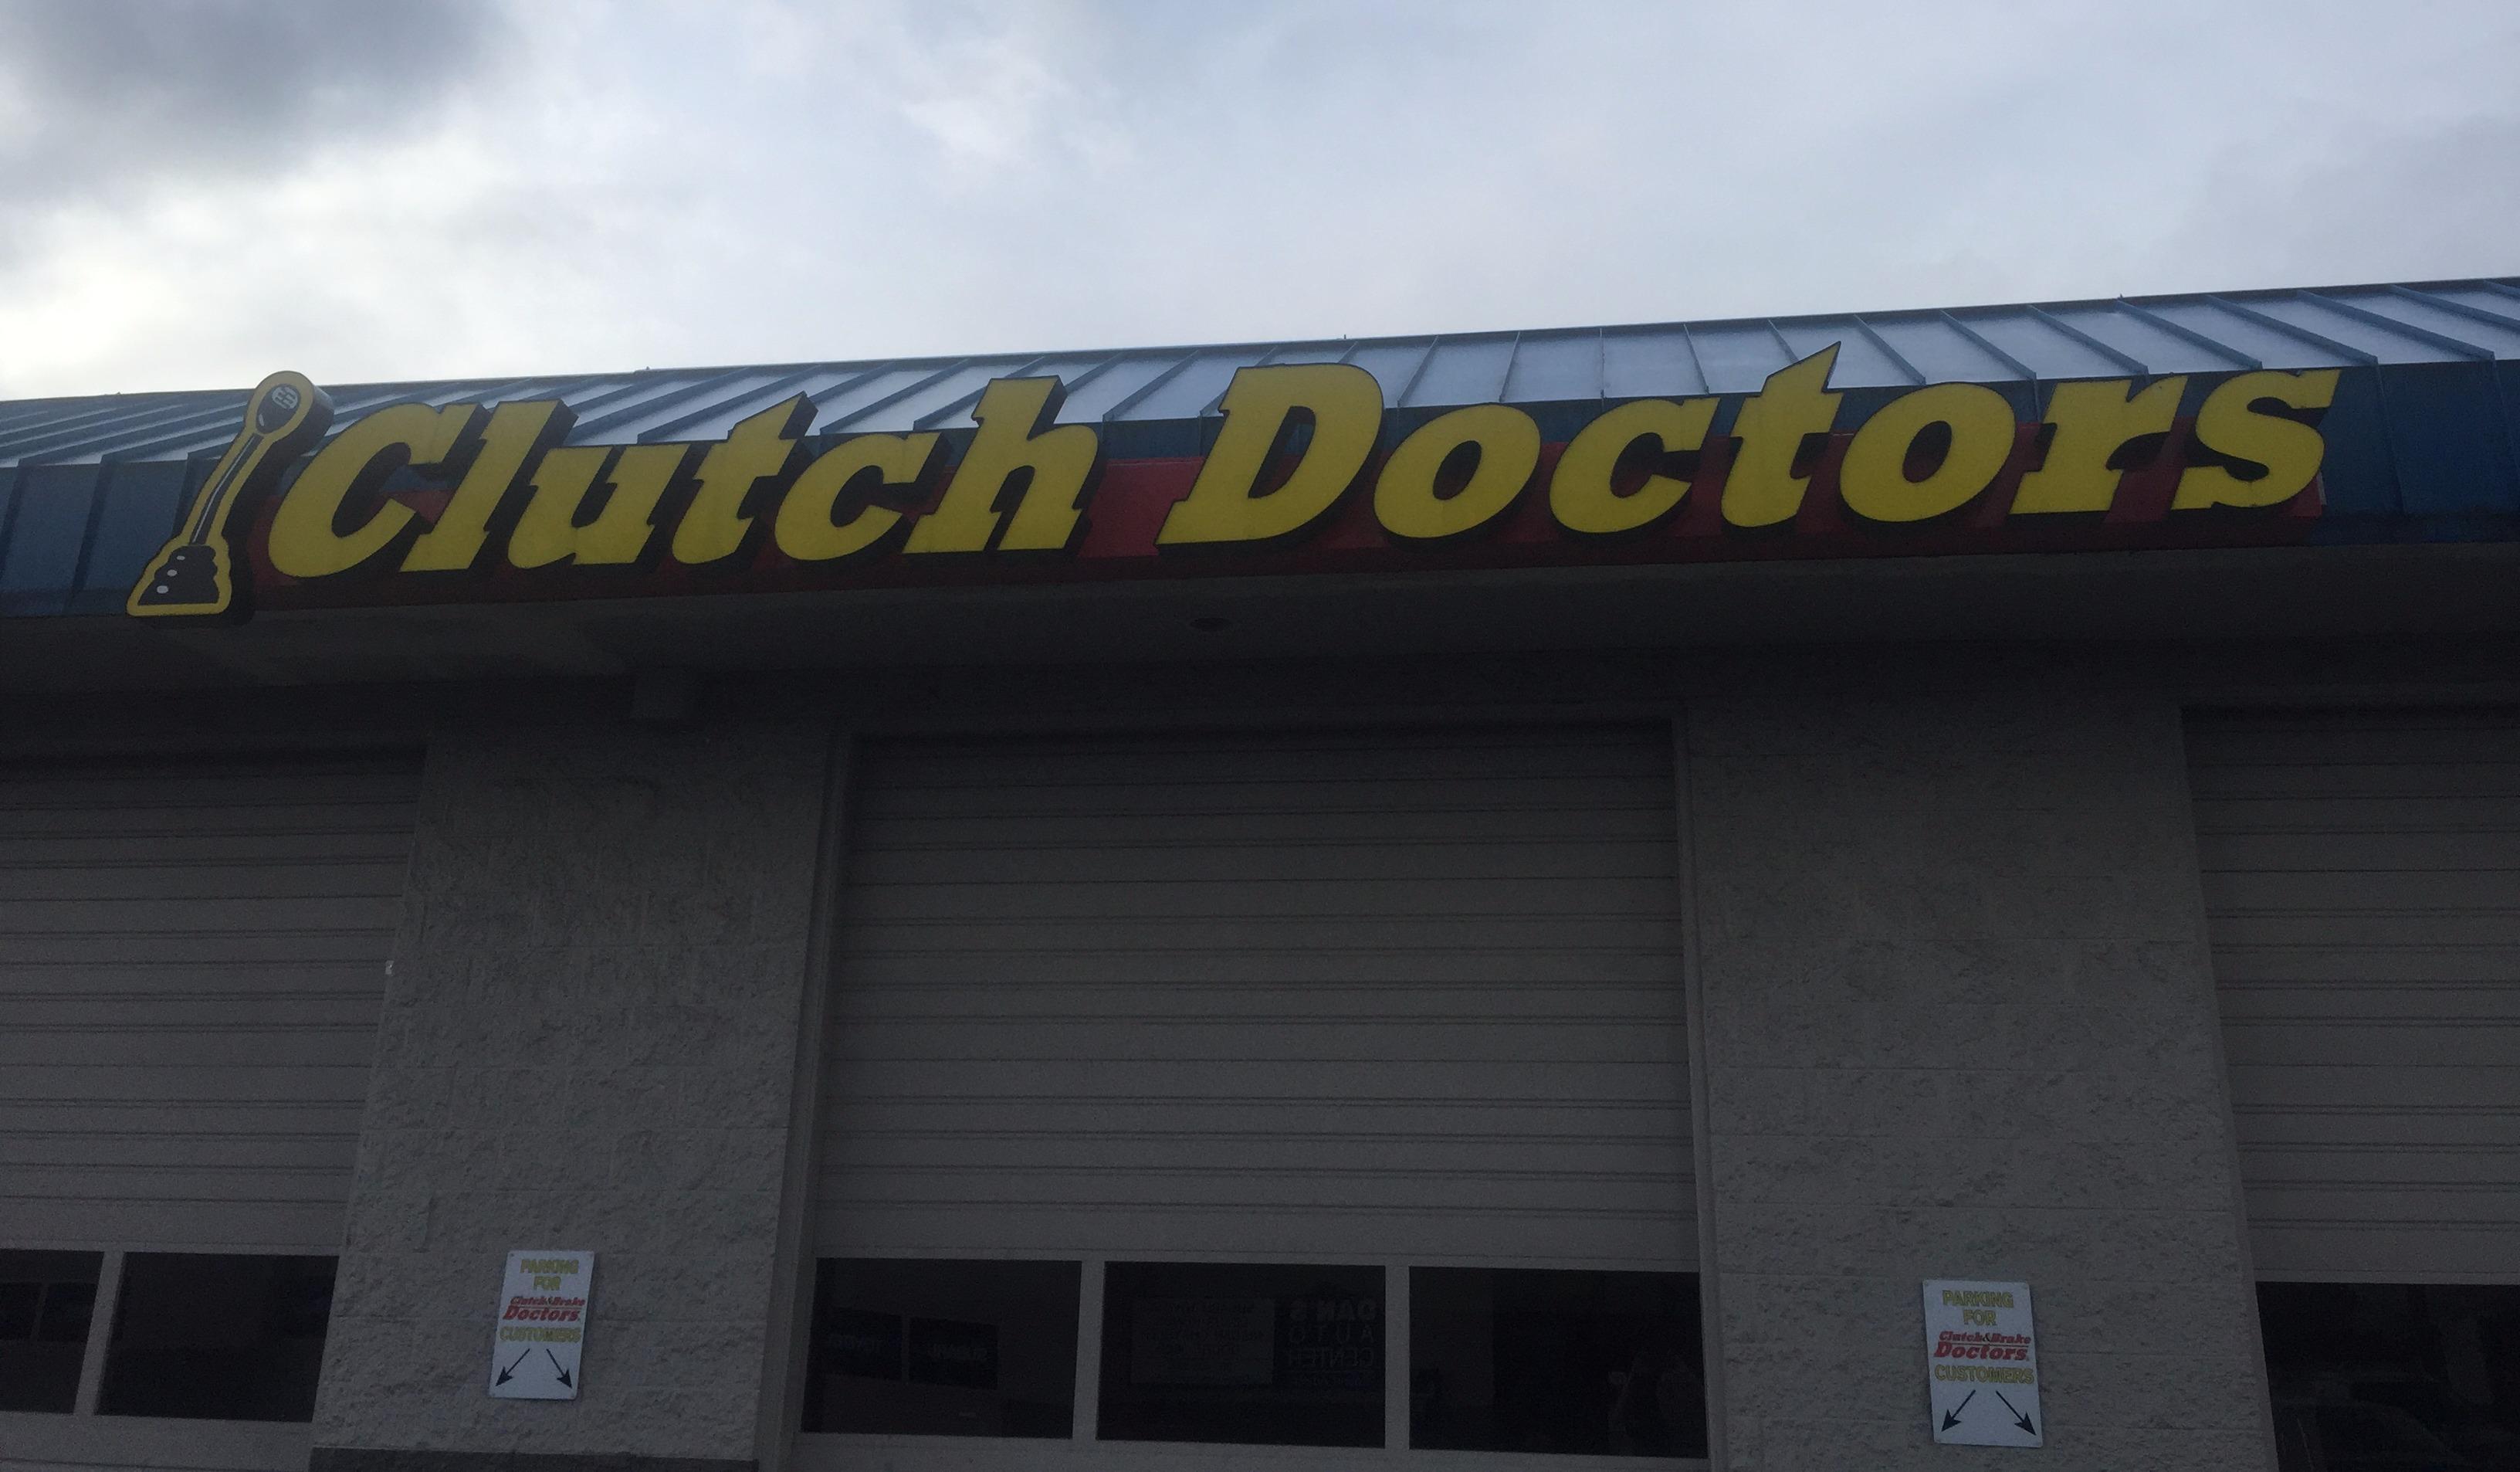 Clutch & Brake Doctors Lake Oswego Auto Repair image 1